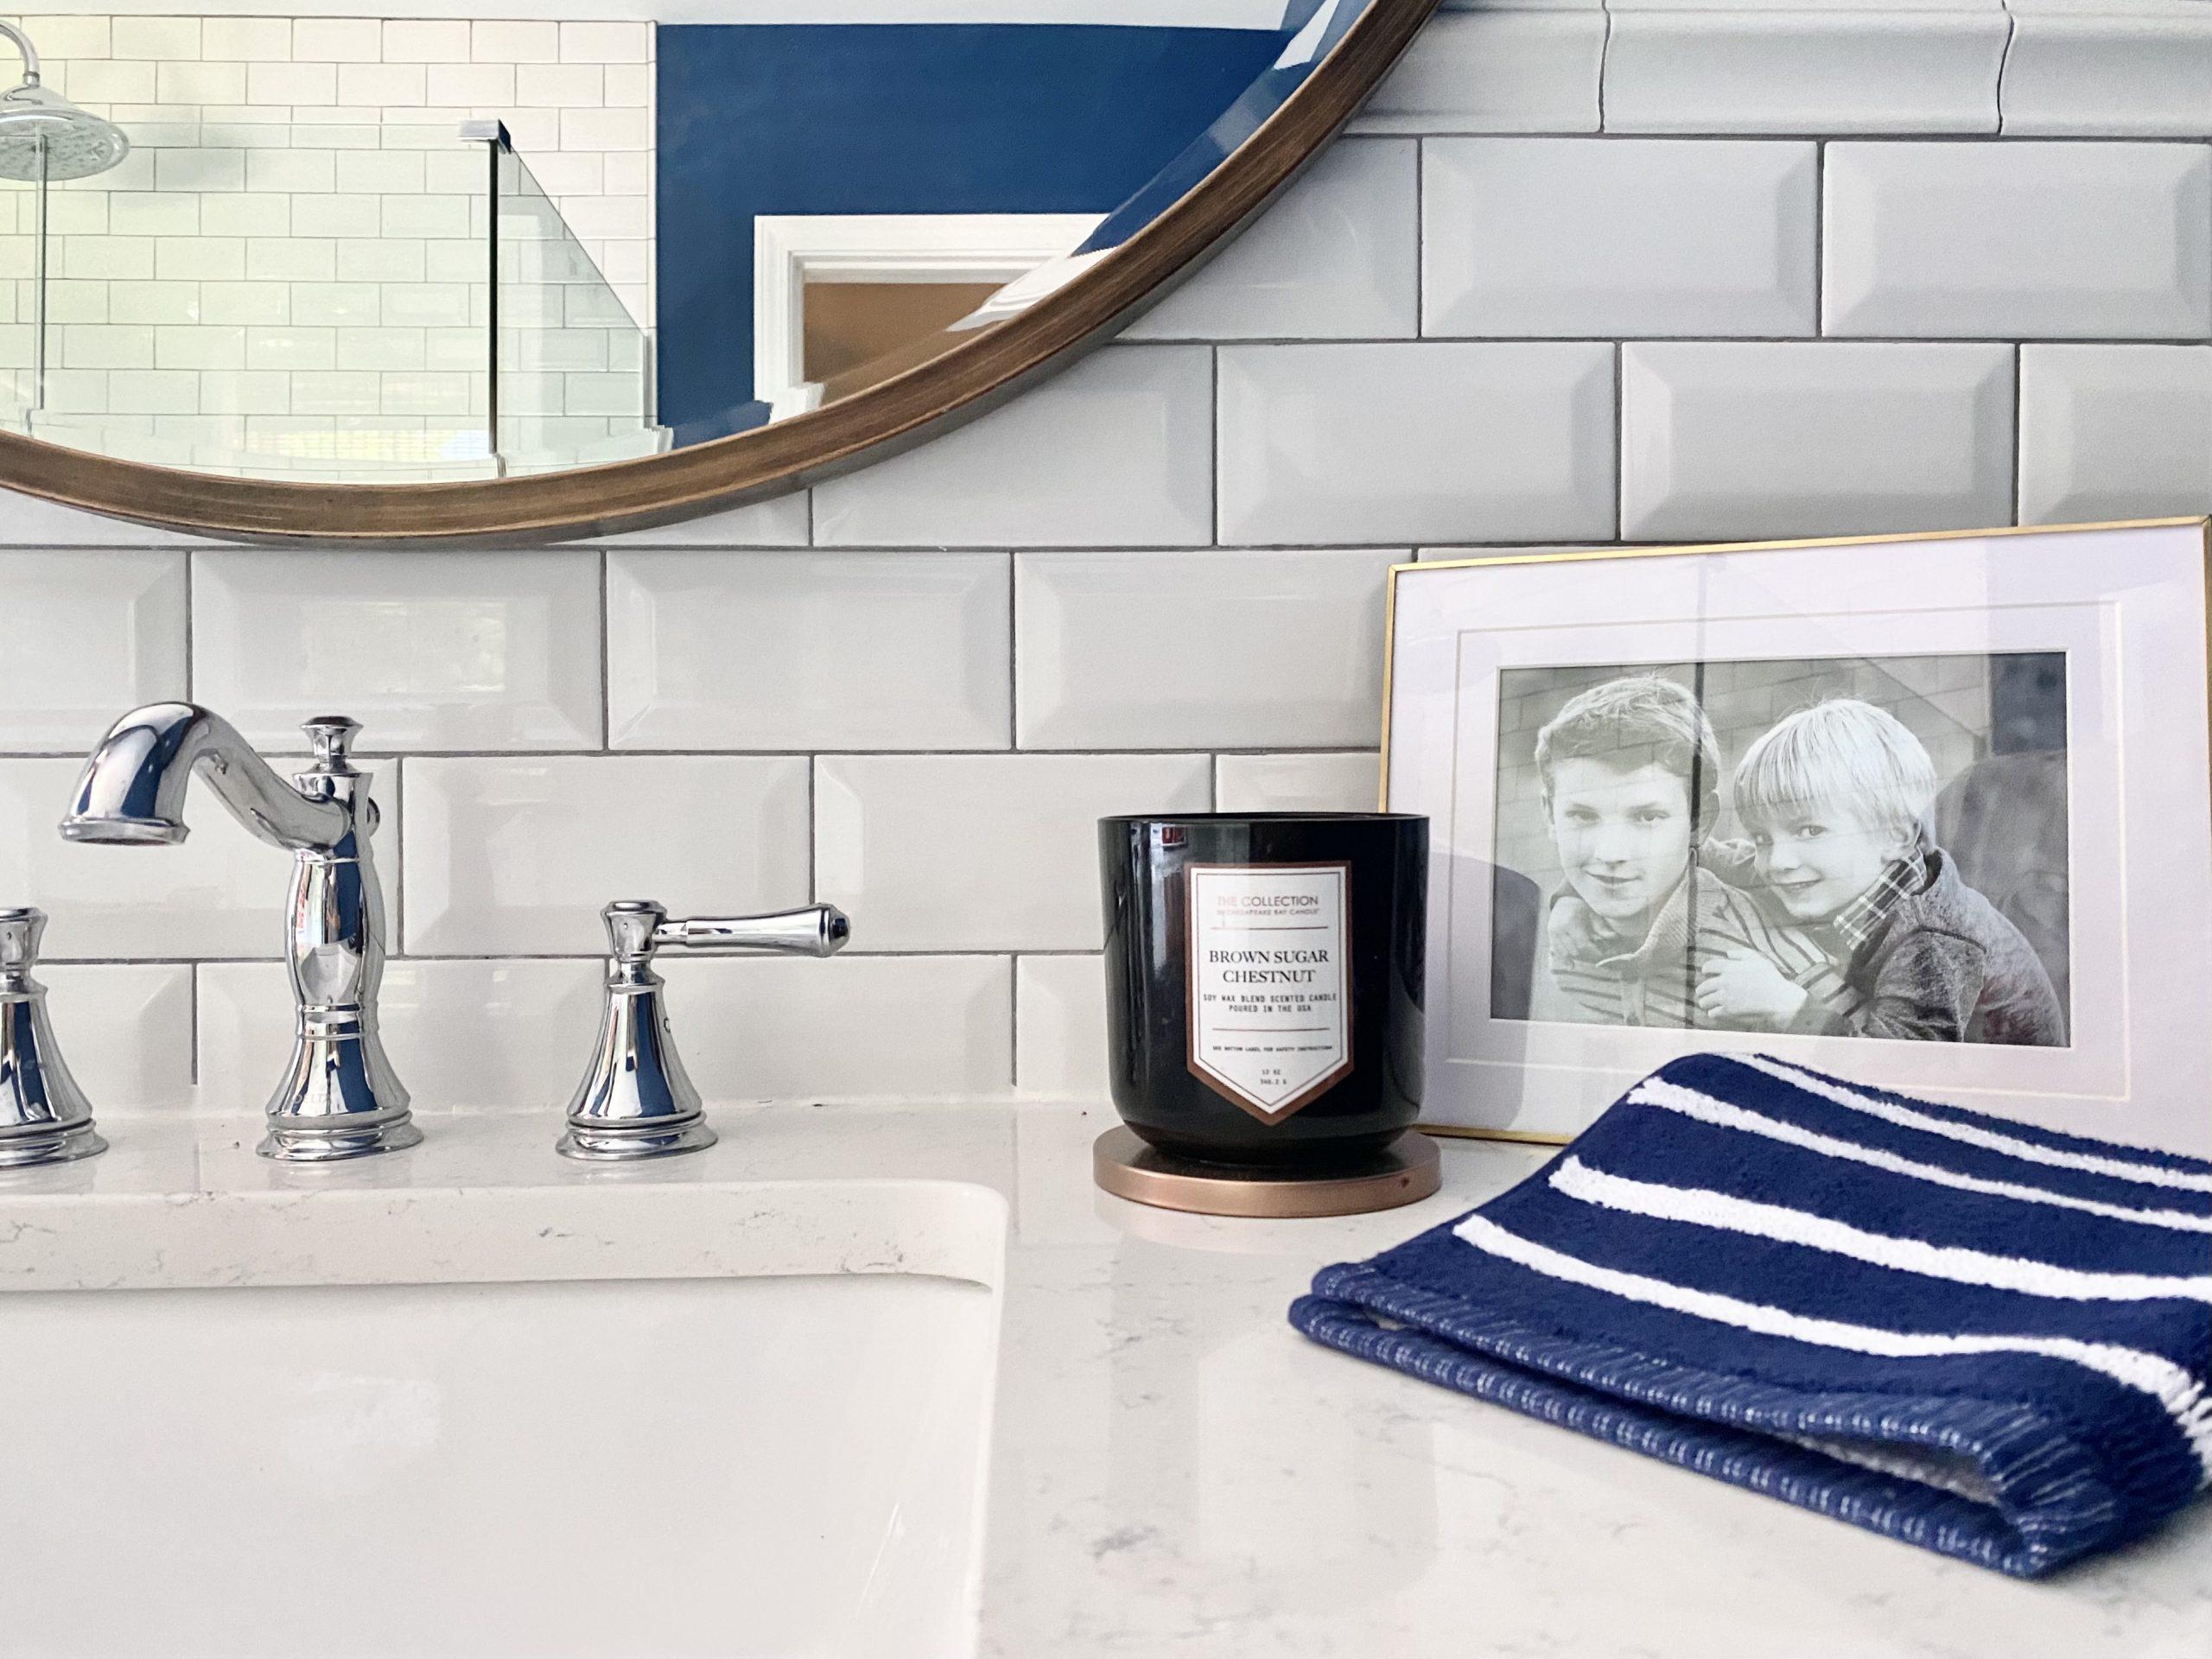 Gap-Home-Walmart-boys-bathroom